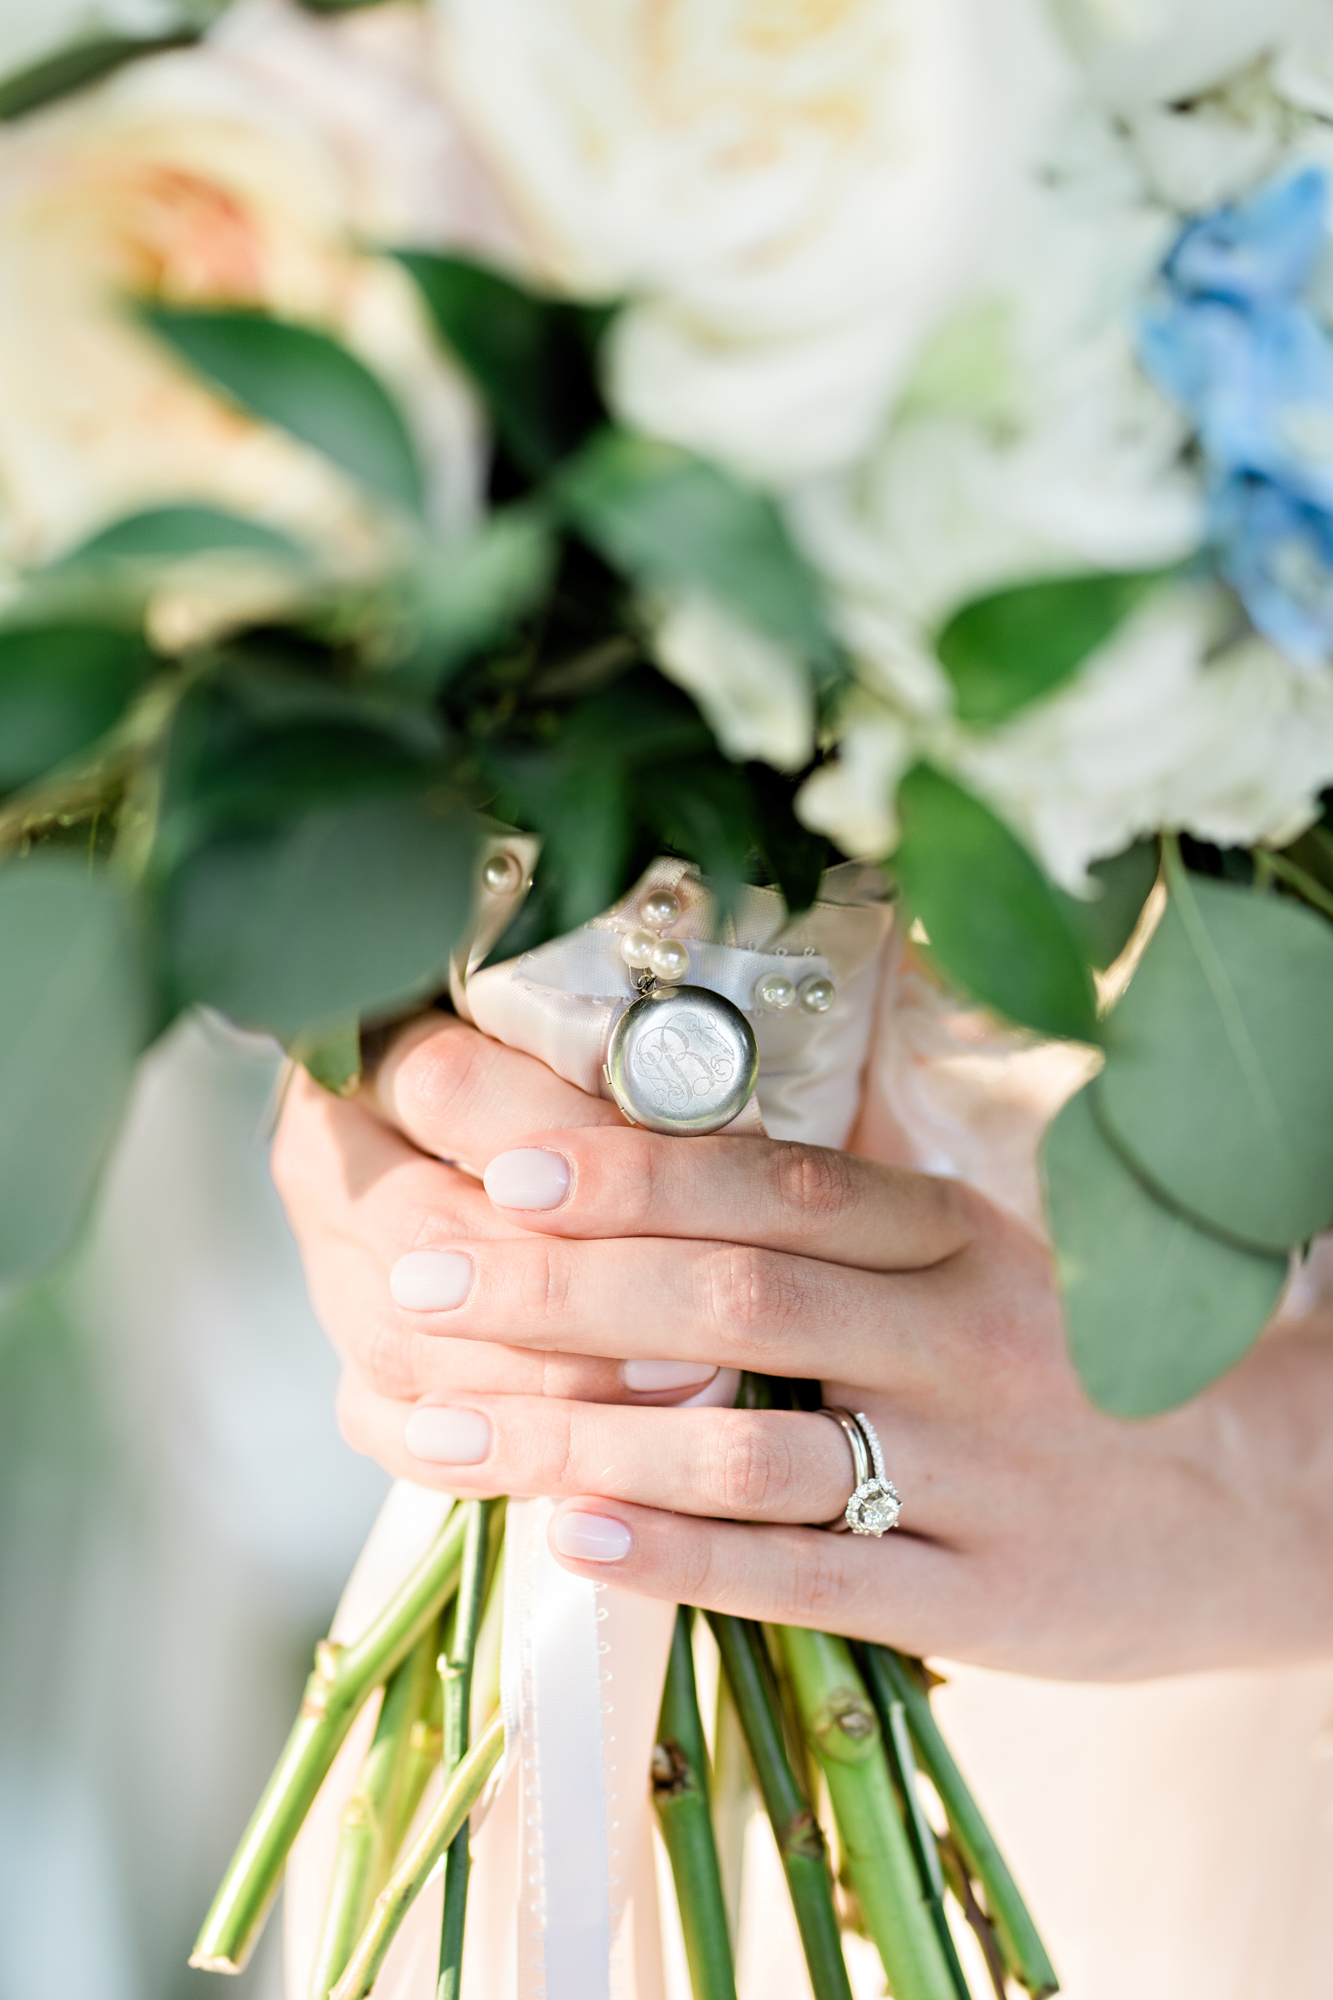 Alabama-Photographers-Nick-Drollette-Wedding-Photography-153.jpg